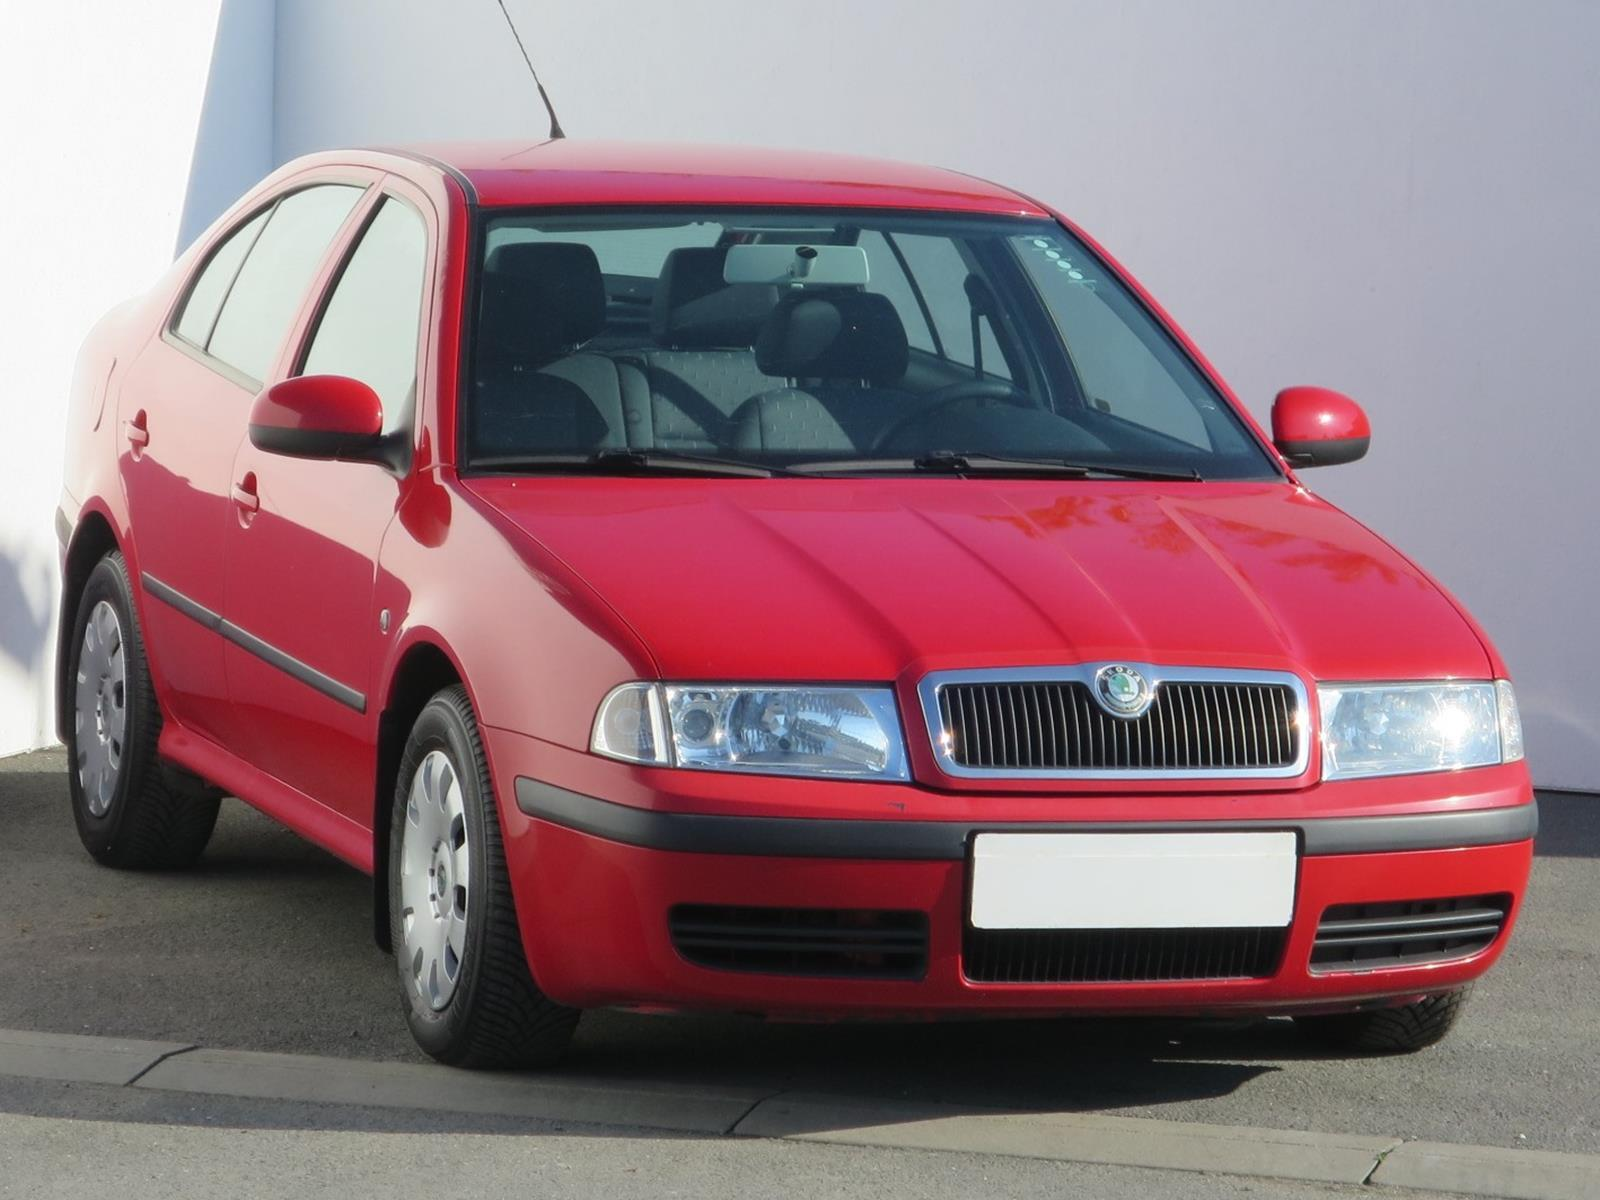 Škoda Octavia 1.9 TDI  74kW hatchback nafta